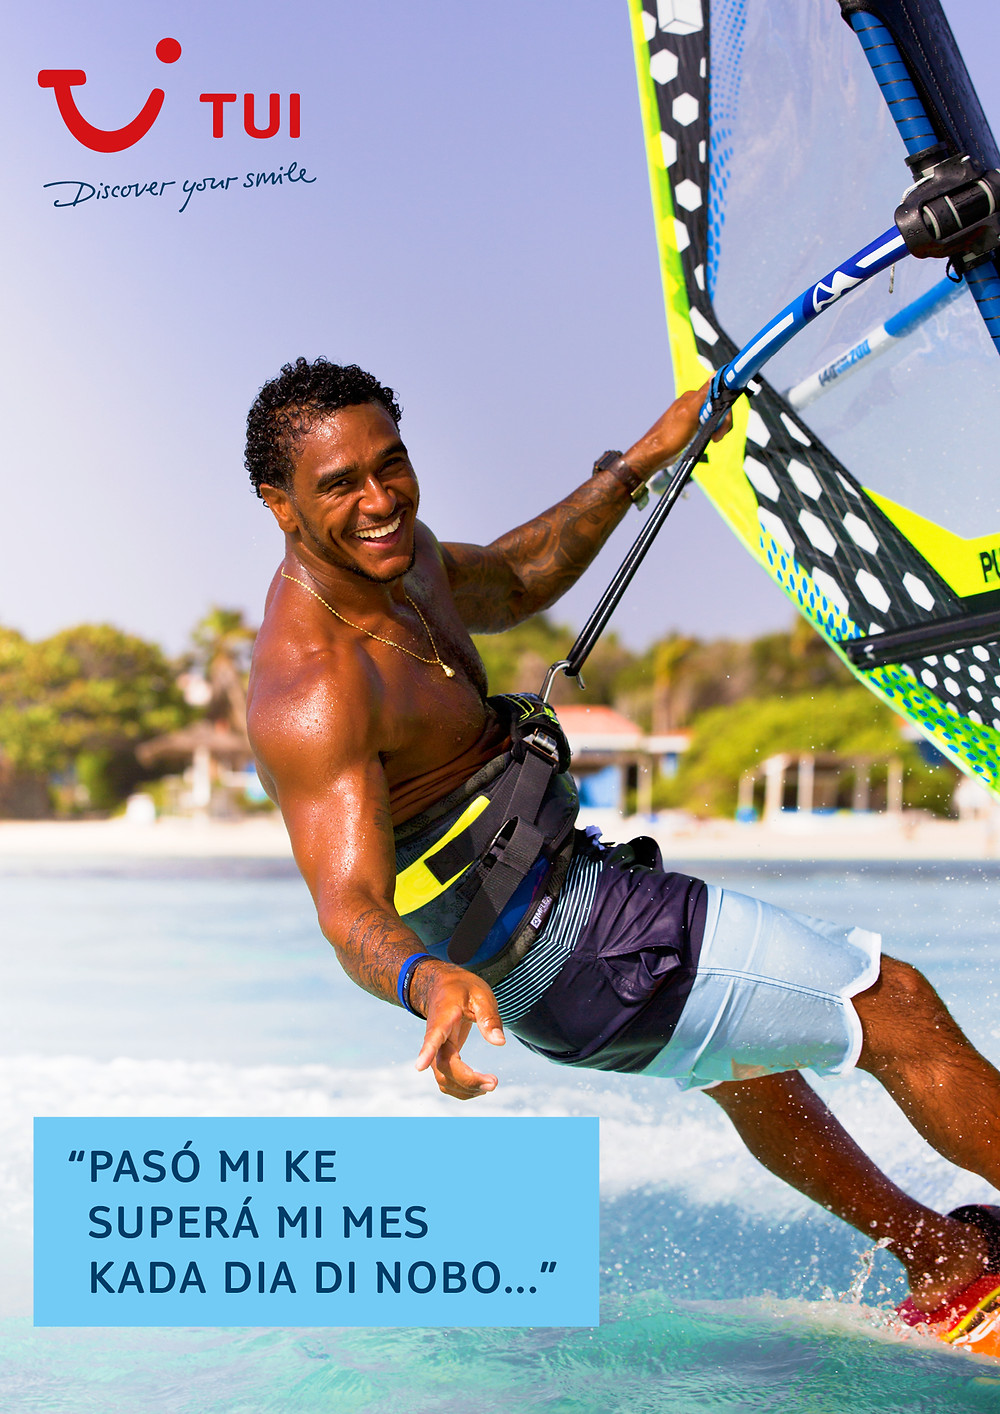 XpBonaire, IslandLife, Bonaire, News, Information, TUI, Win Travel Voucher, Discover your smile